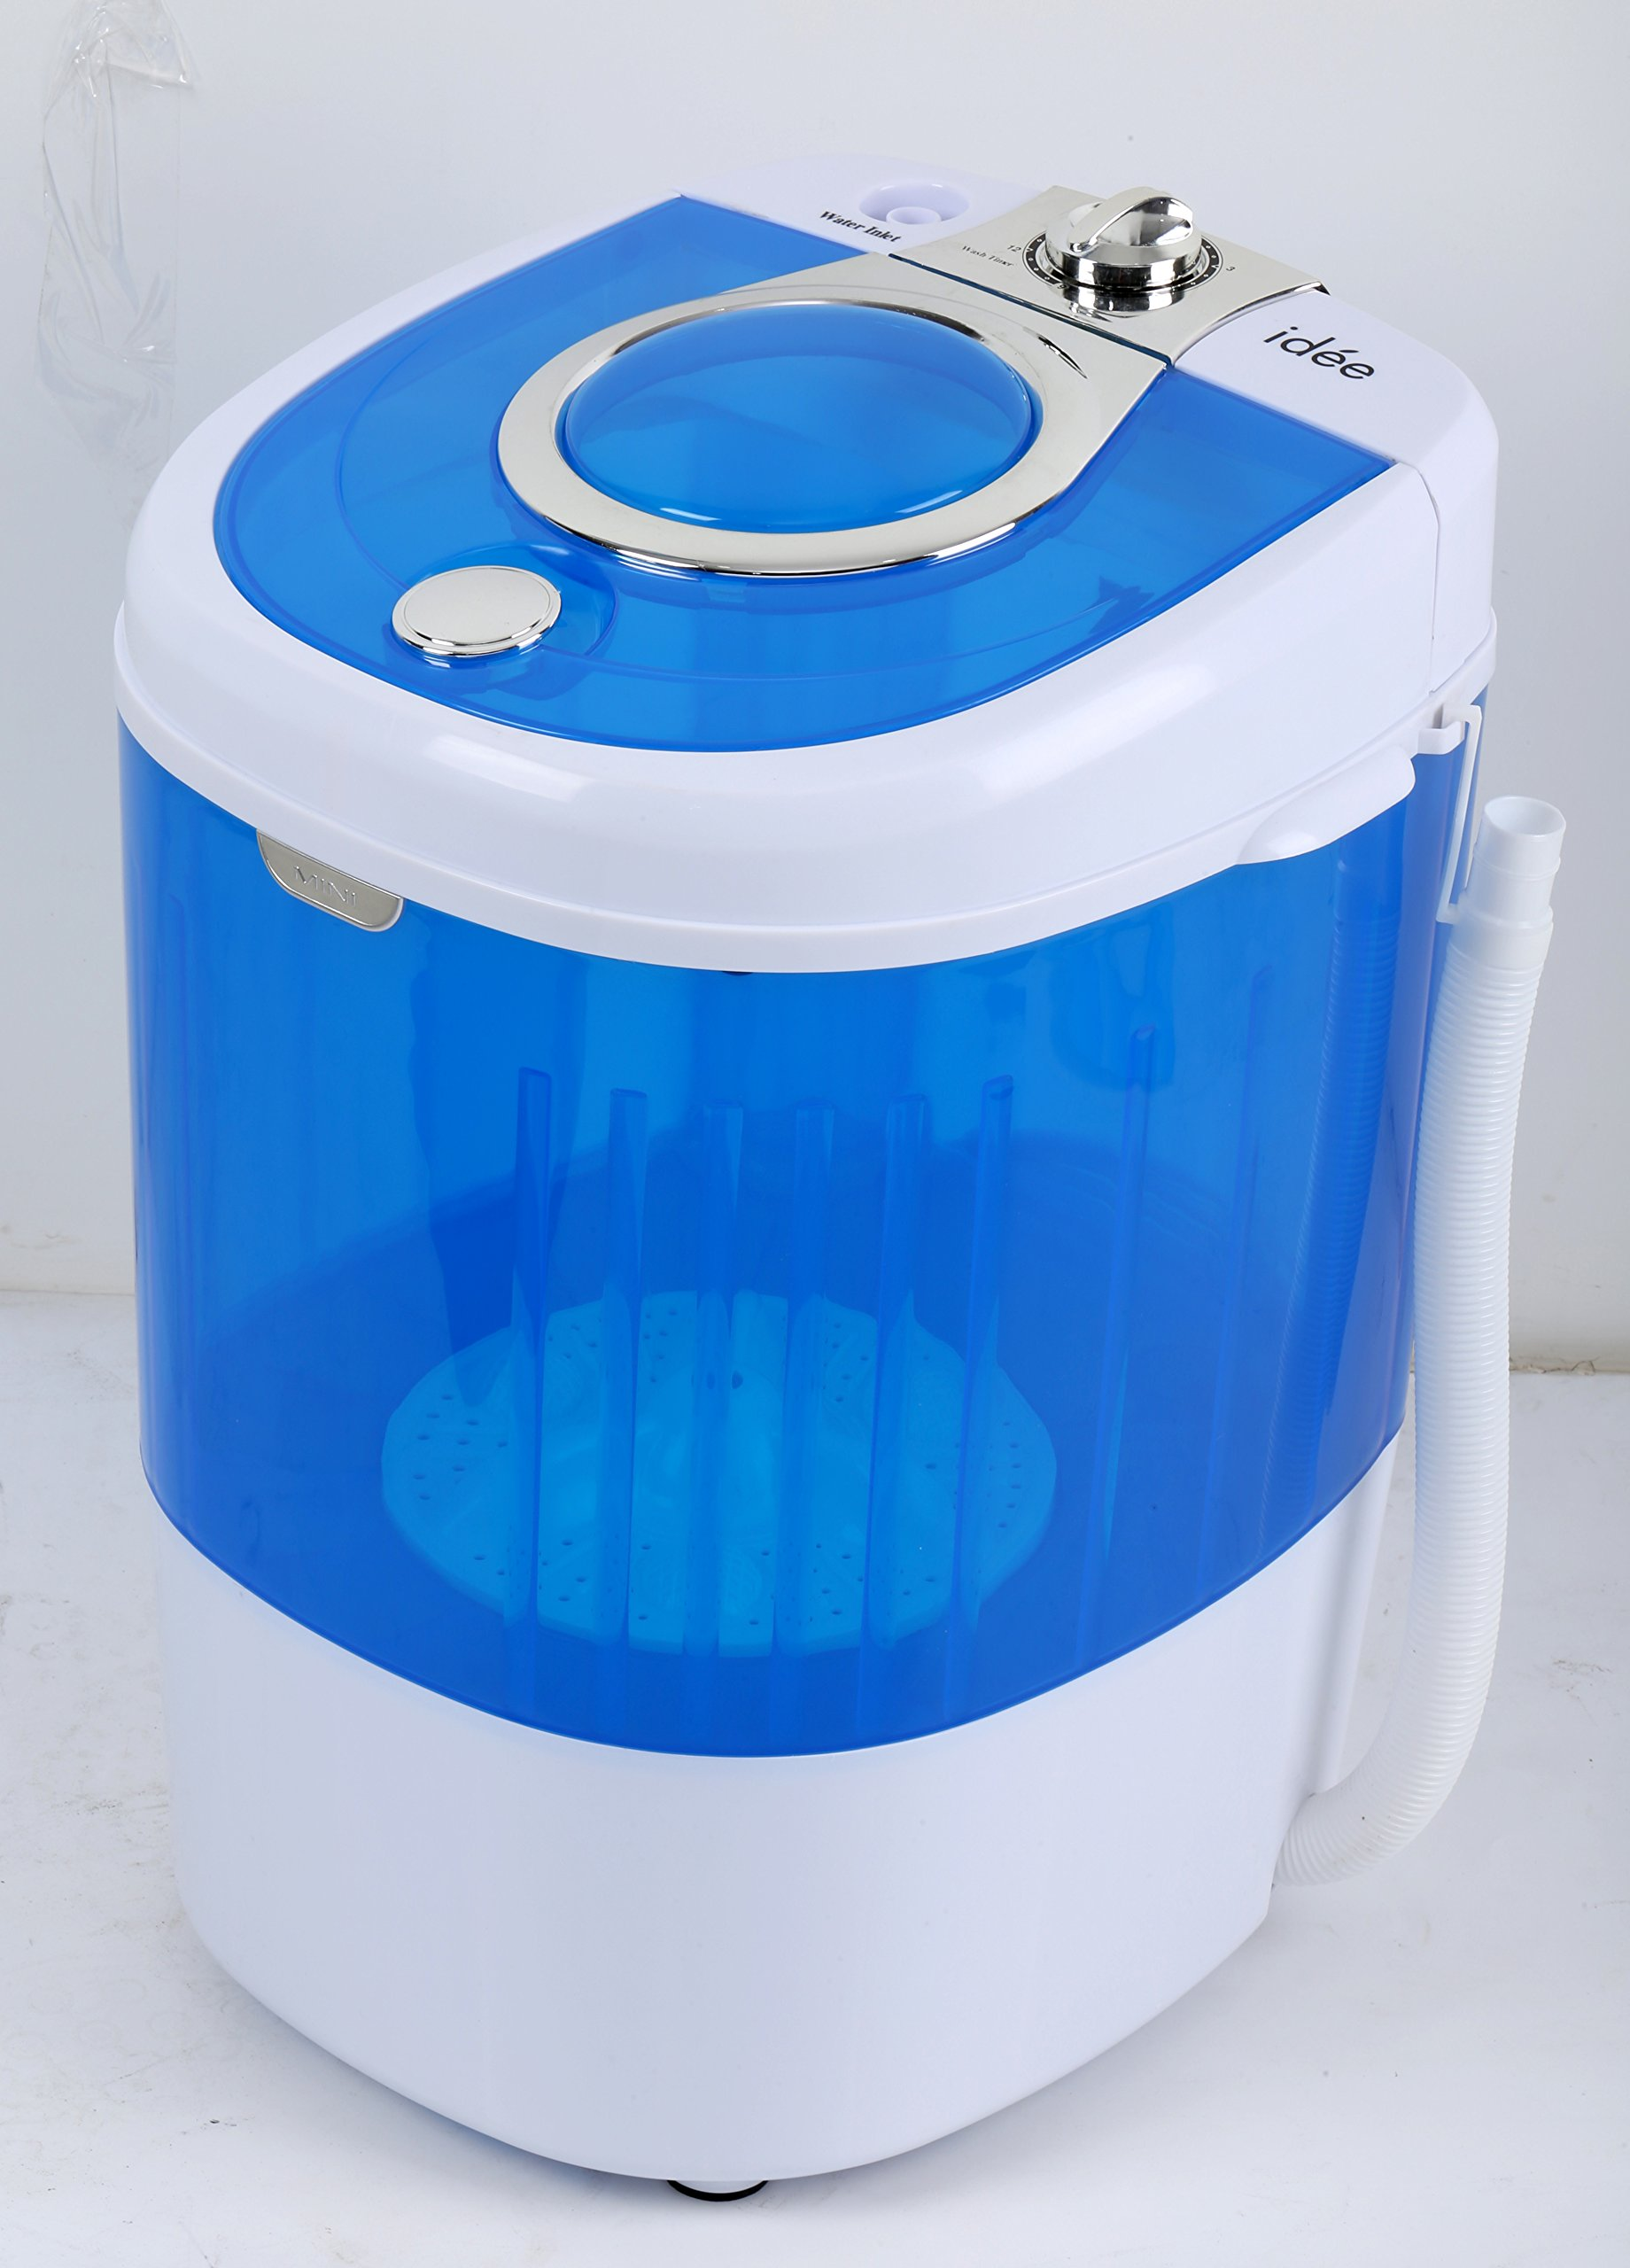 idée HCWM01WE Portable Single Tub 5.5 lb Capacity Semi-Automatic Mini Washer, Blue/White